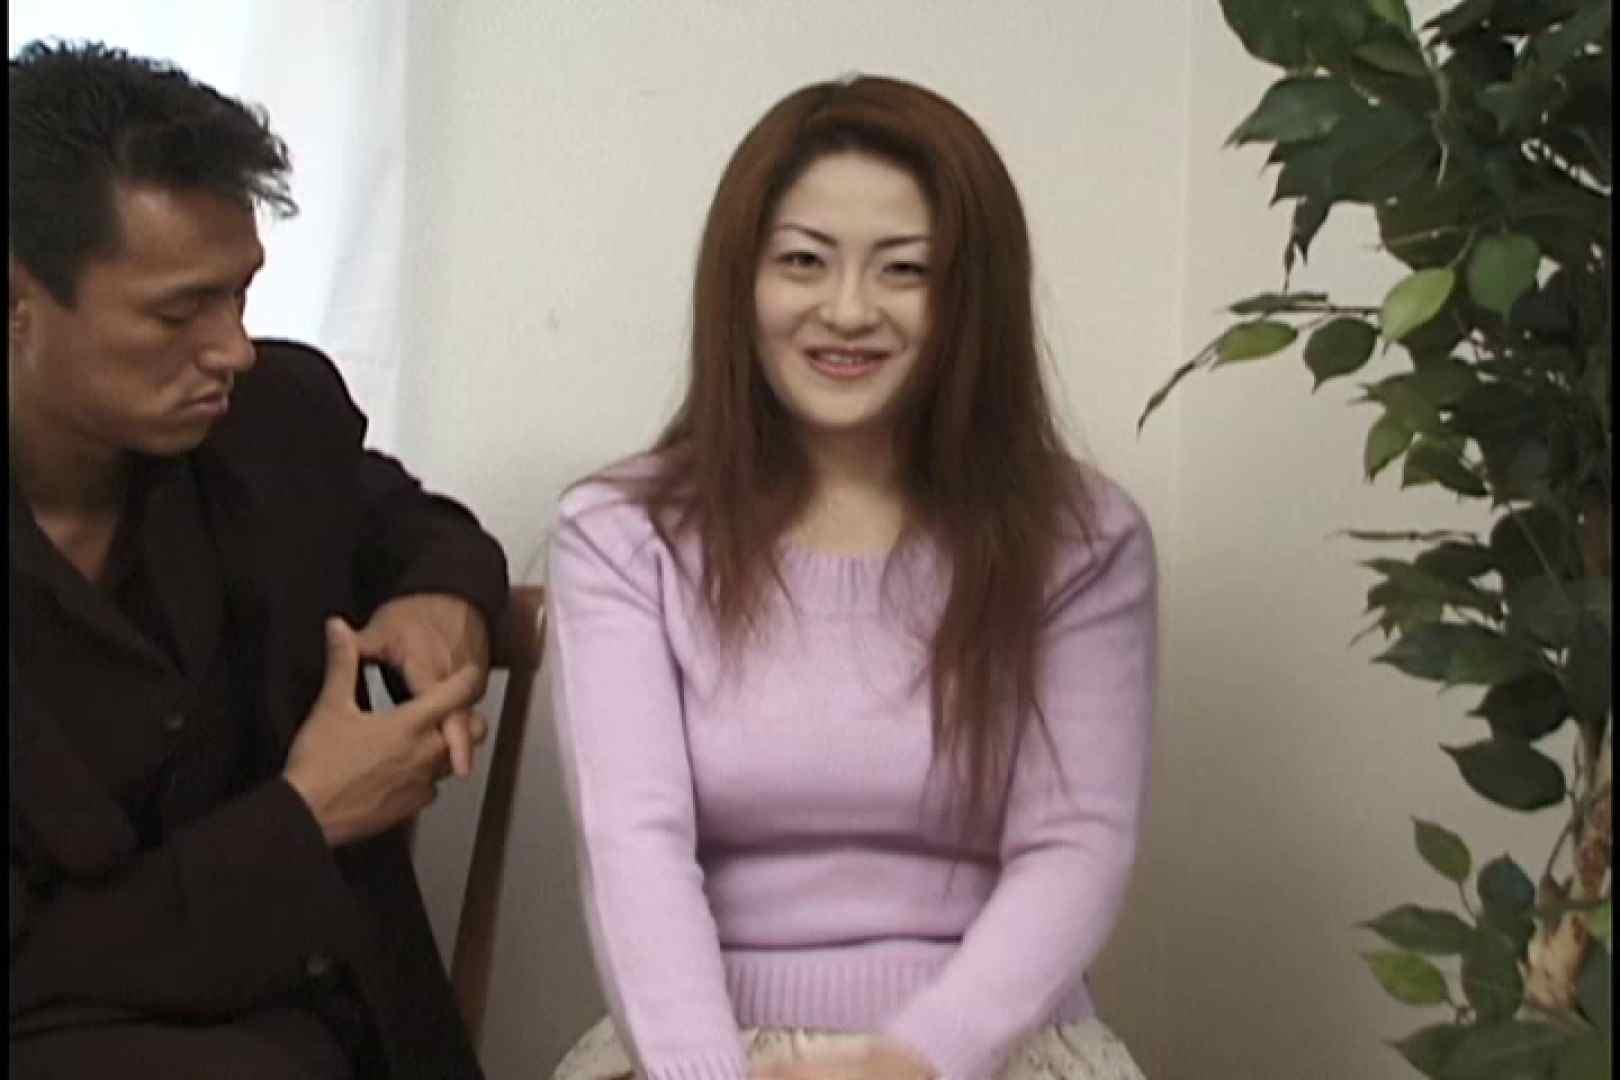 昼間の奥様は欲求不満 ~青井祐子~ 熟女  43連発 5